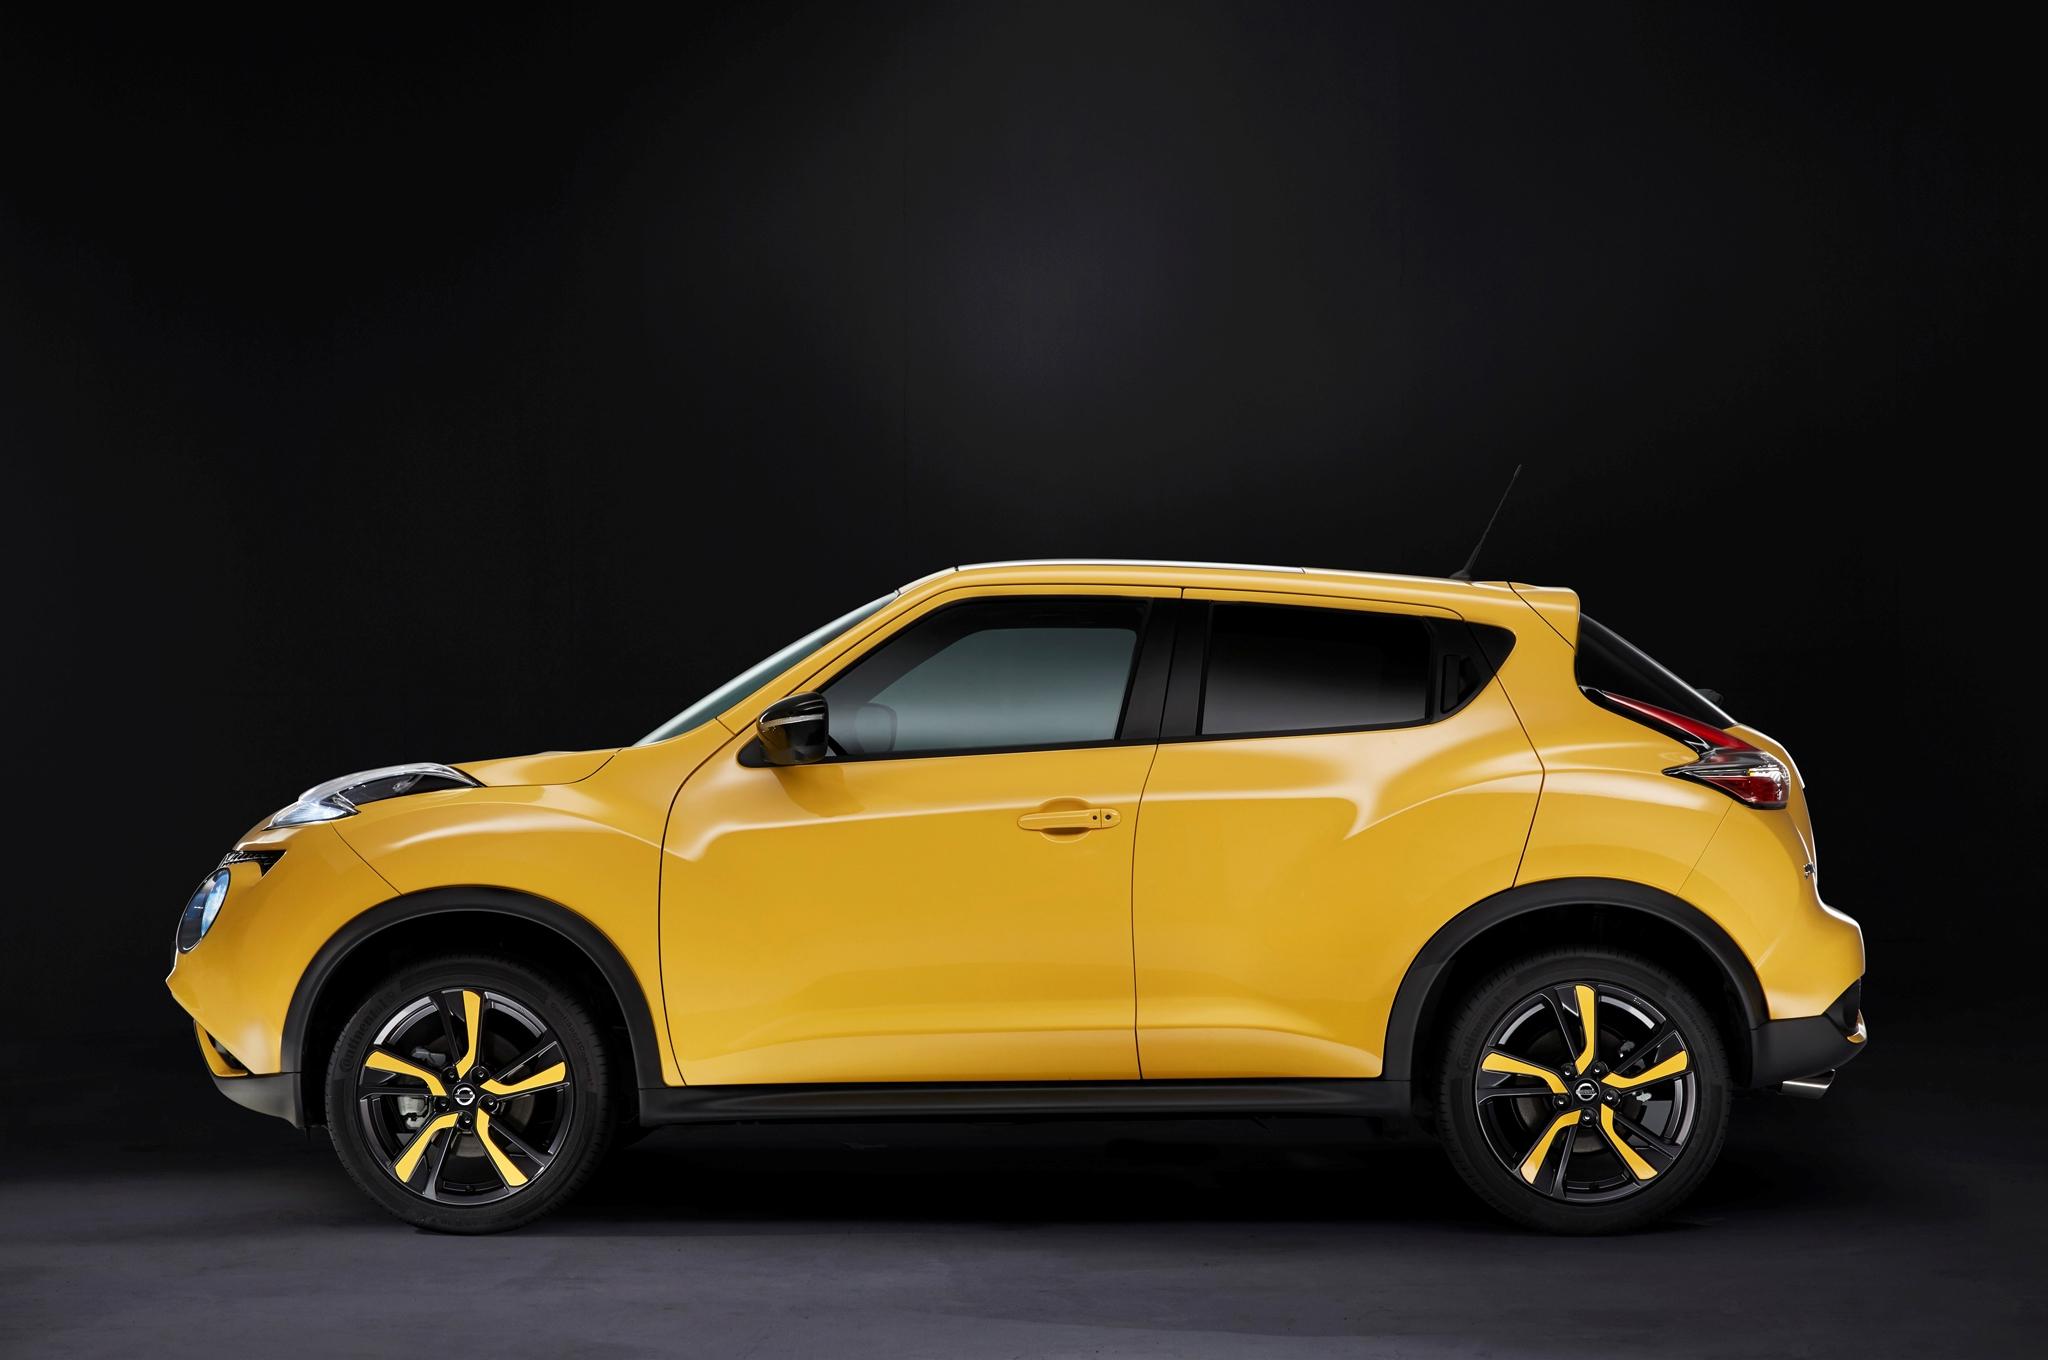 2015 Nissan Juke Information And Photos Zombiedrive